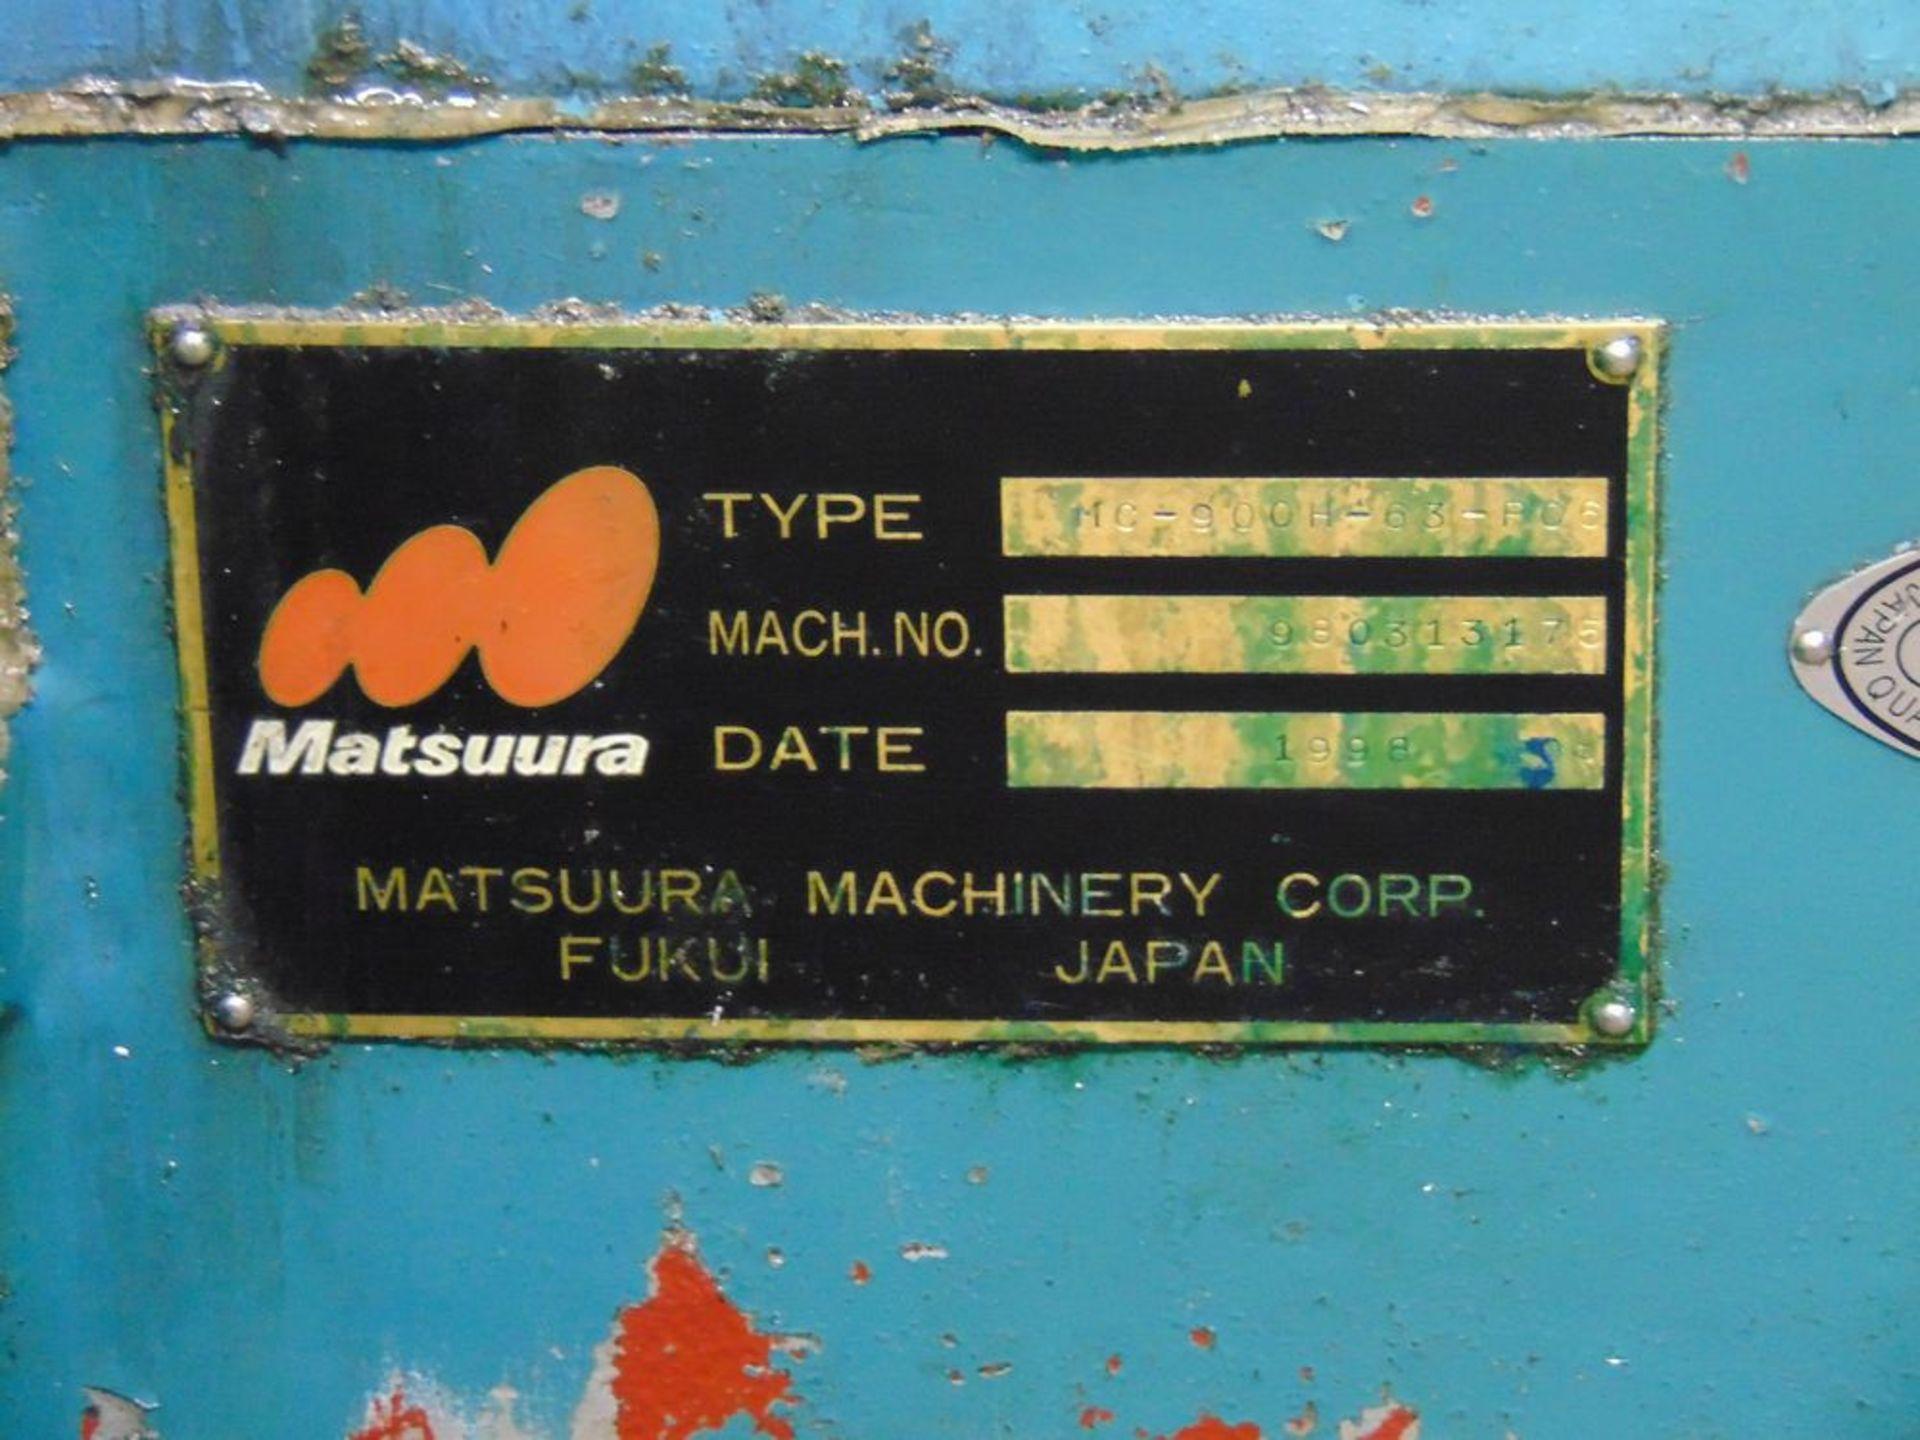 (1998) Matsuura mod. MC900 H-63-PC6, 4-Axis CNC Horizontal Machine Center w/ Fanuc 15M Controls, 6- - Image 5 of 5